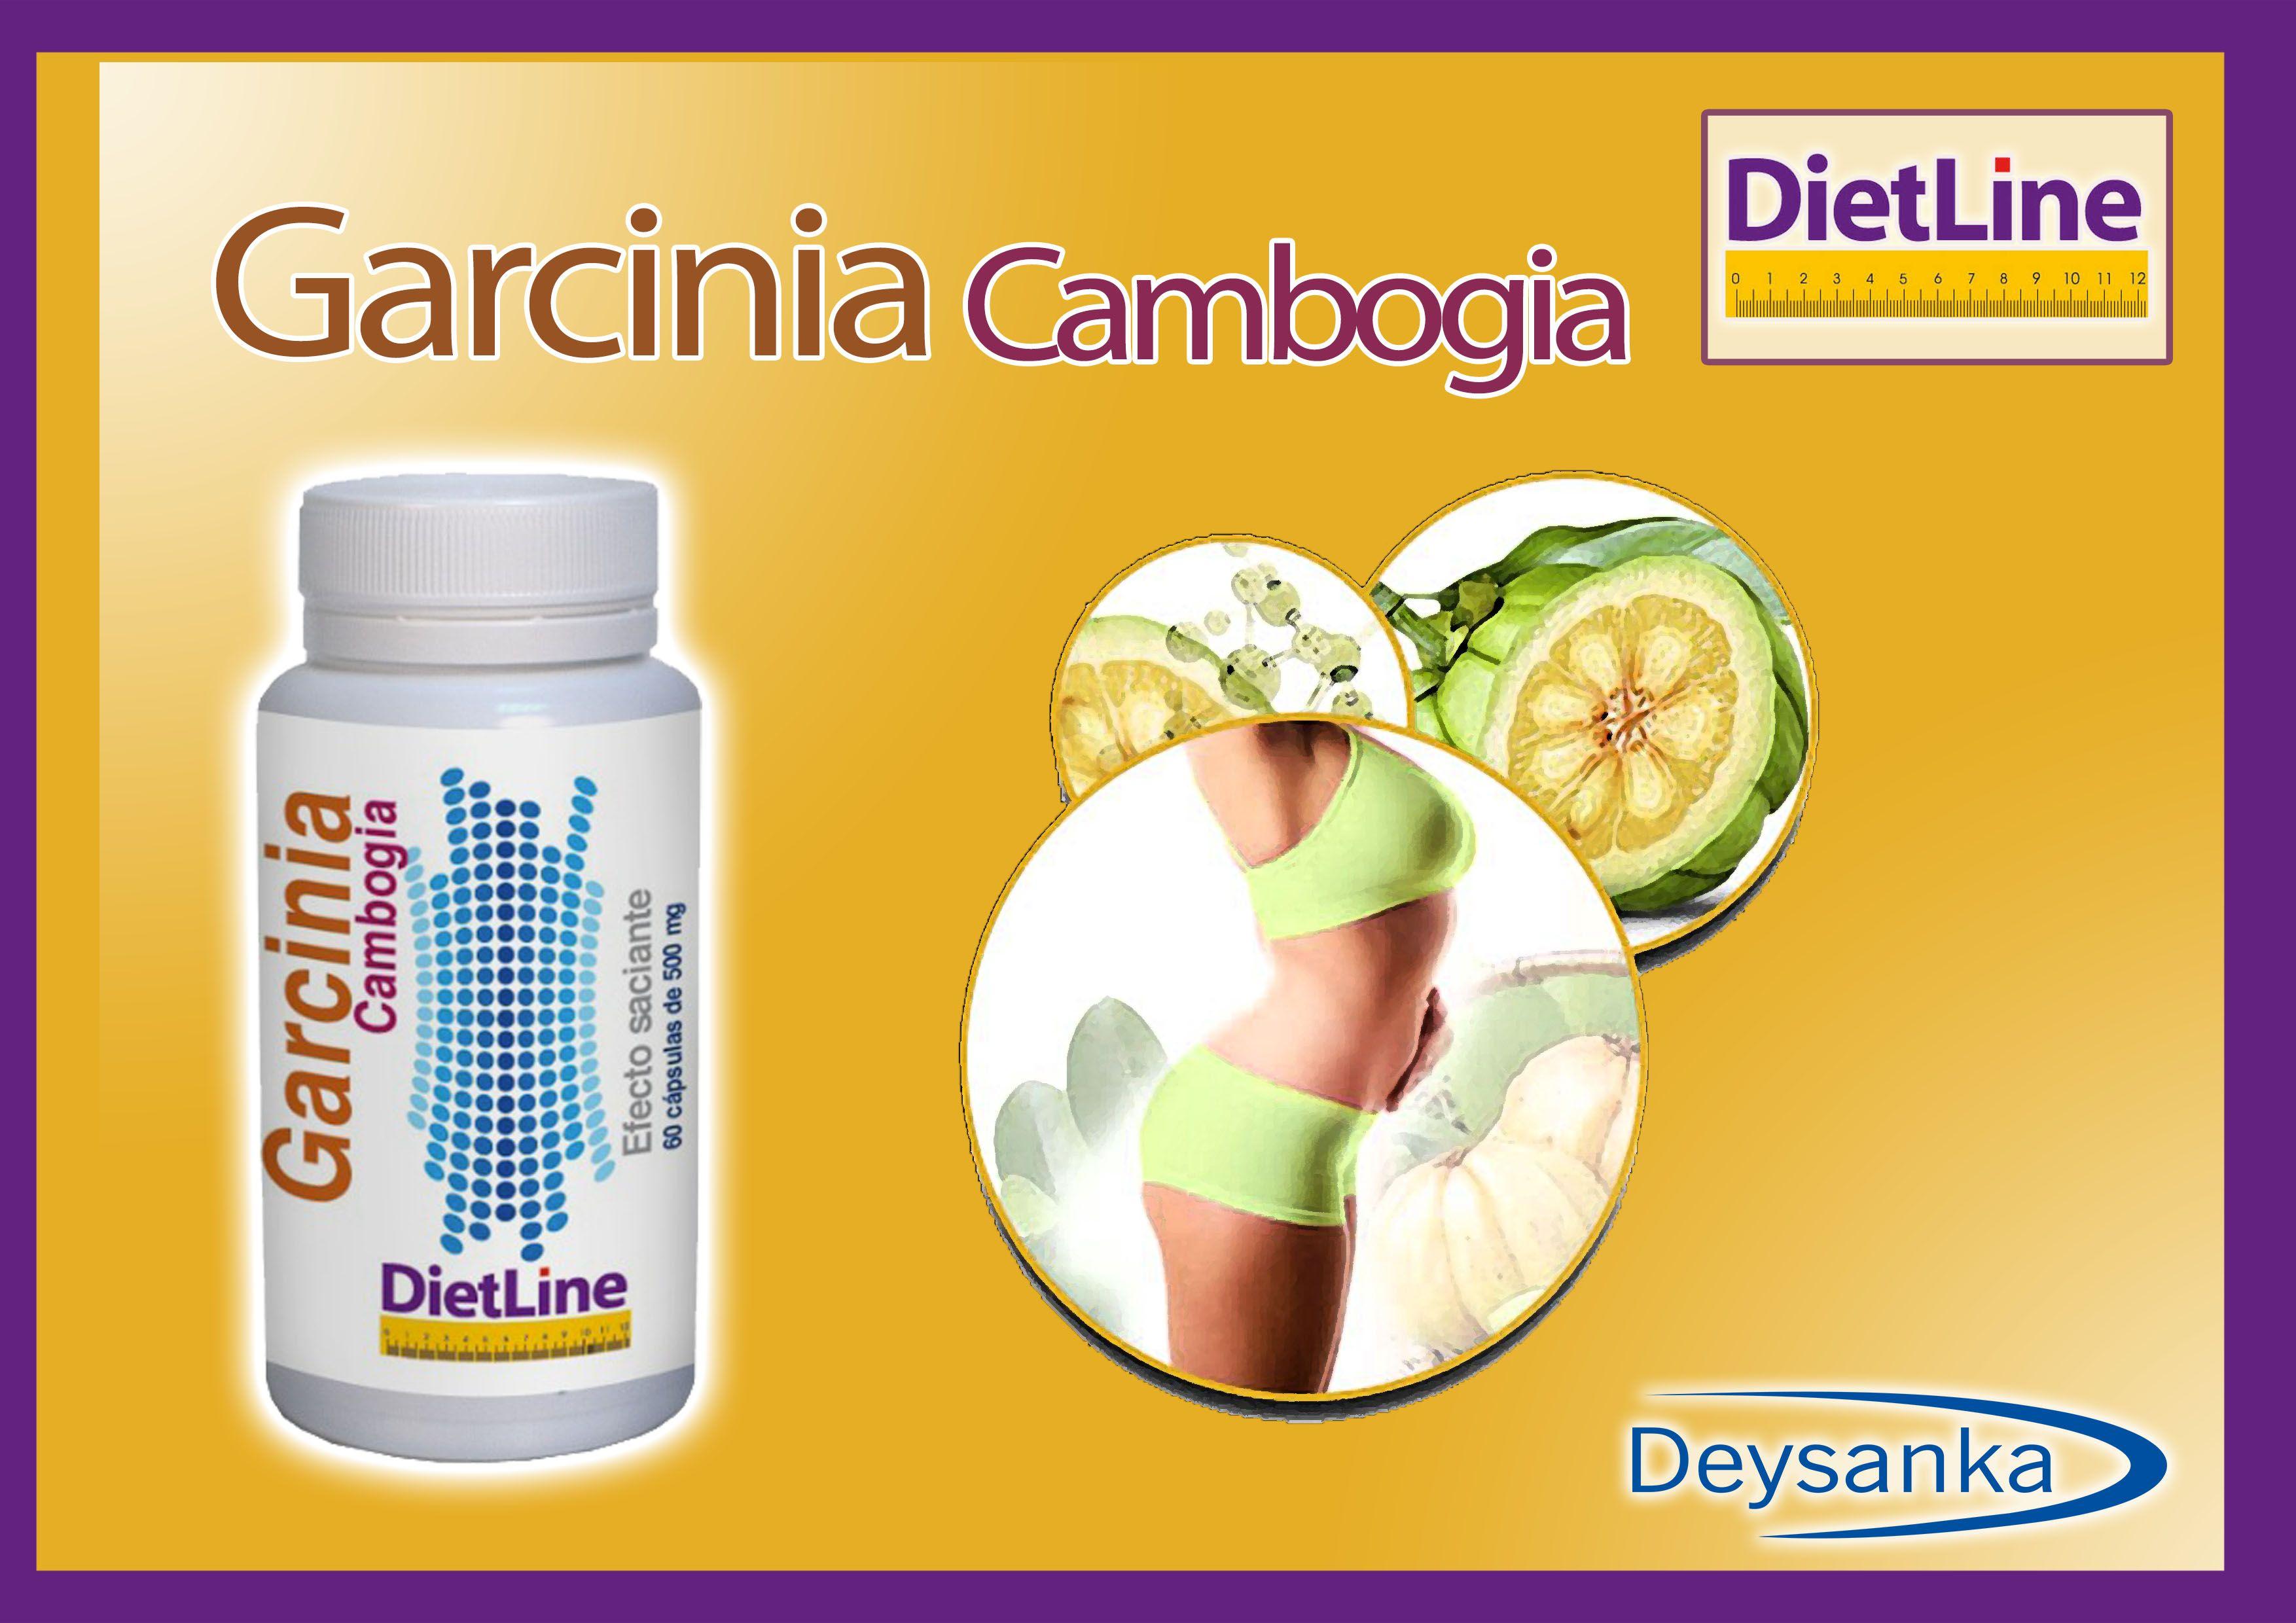 weight loss doctors in vidalia georgia